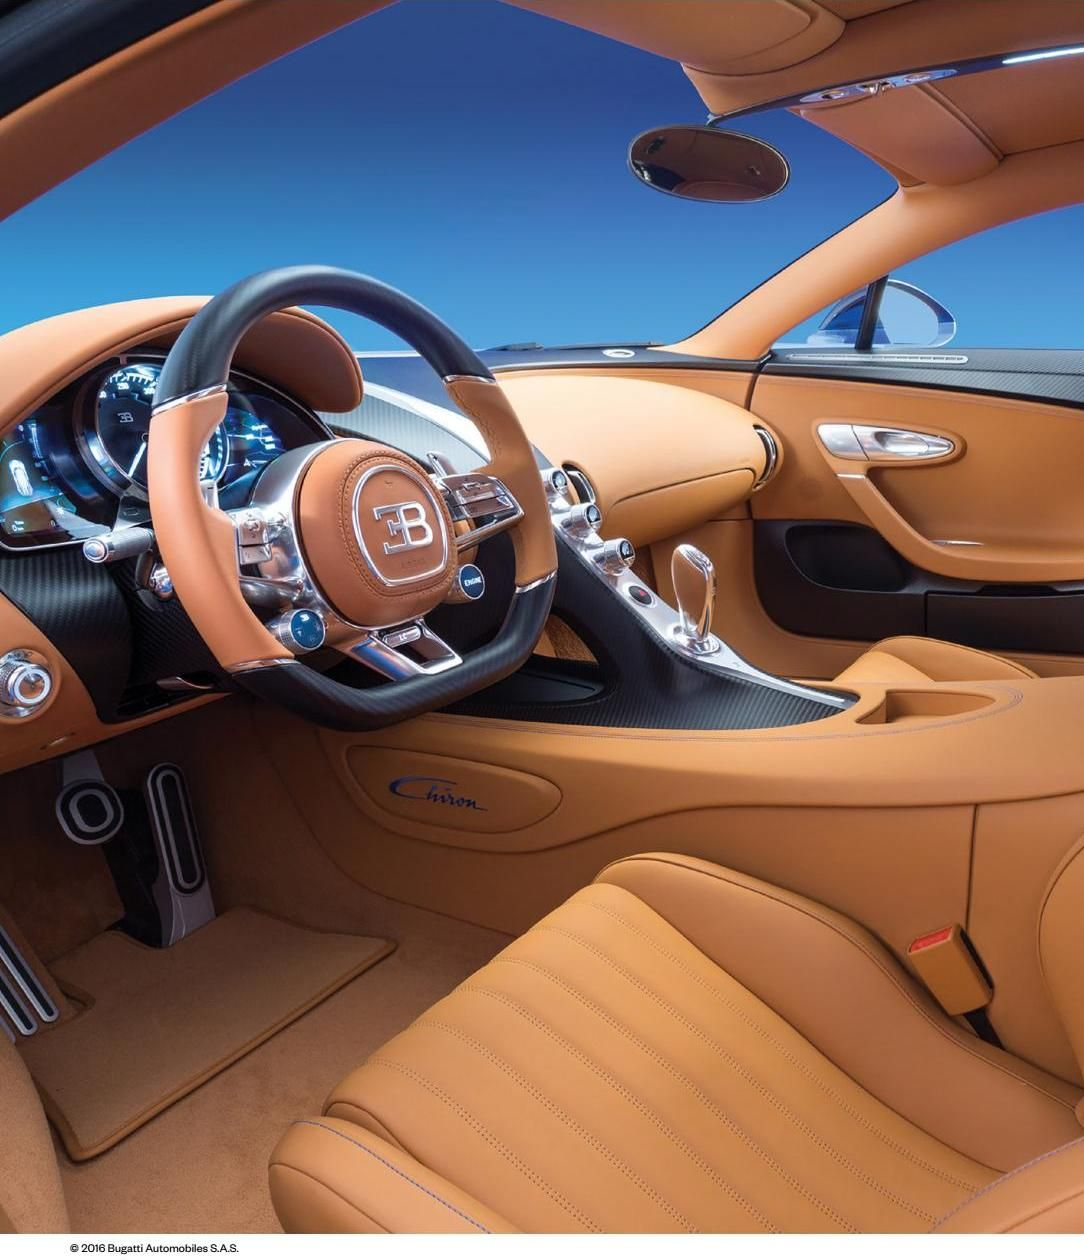 Chiron Super Sport Speedster Looks Like The Veyron: Bugatti Chiron Interior, Bugatti